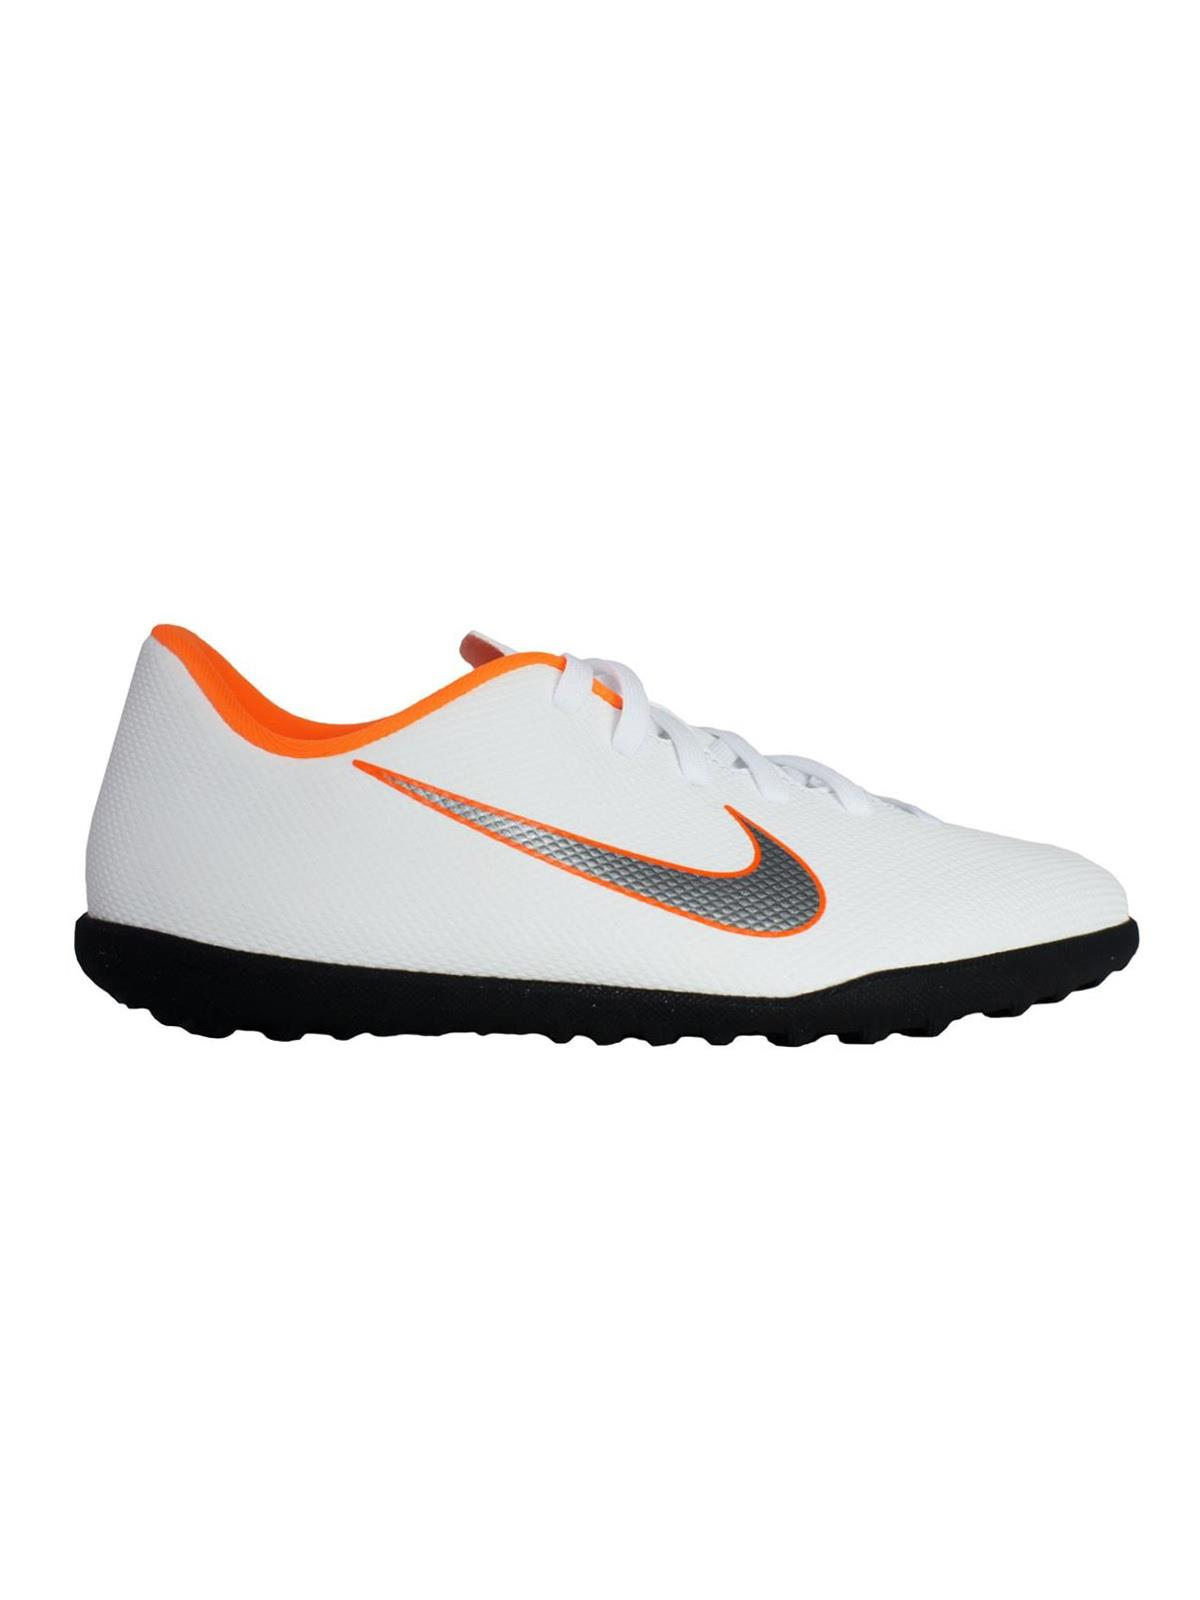 uk availability 6d1b5 65de9 Nike Jr. MercurialX Vapor XII Club TF - NIKE - Citysport